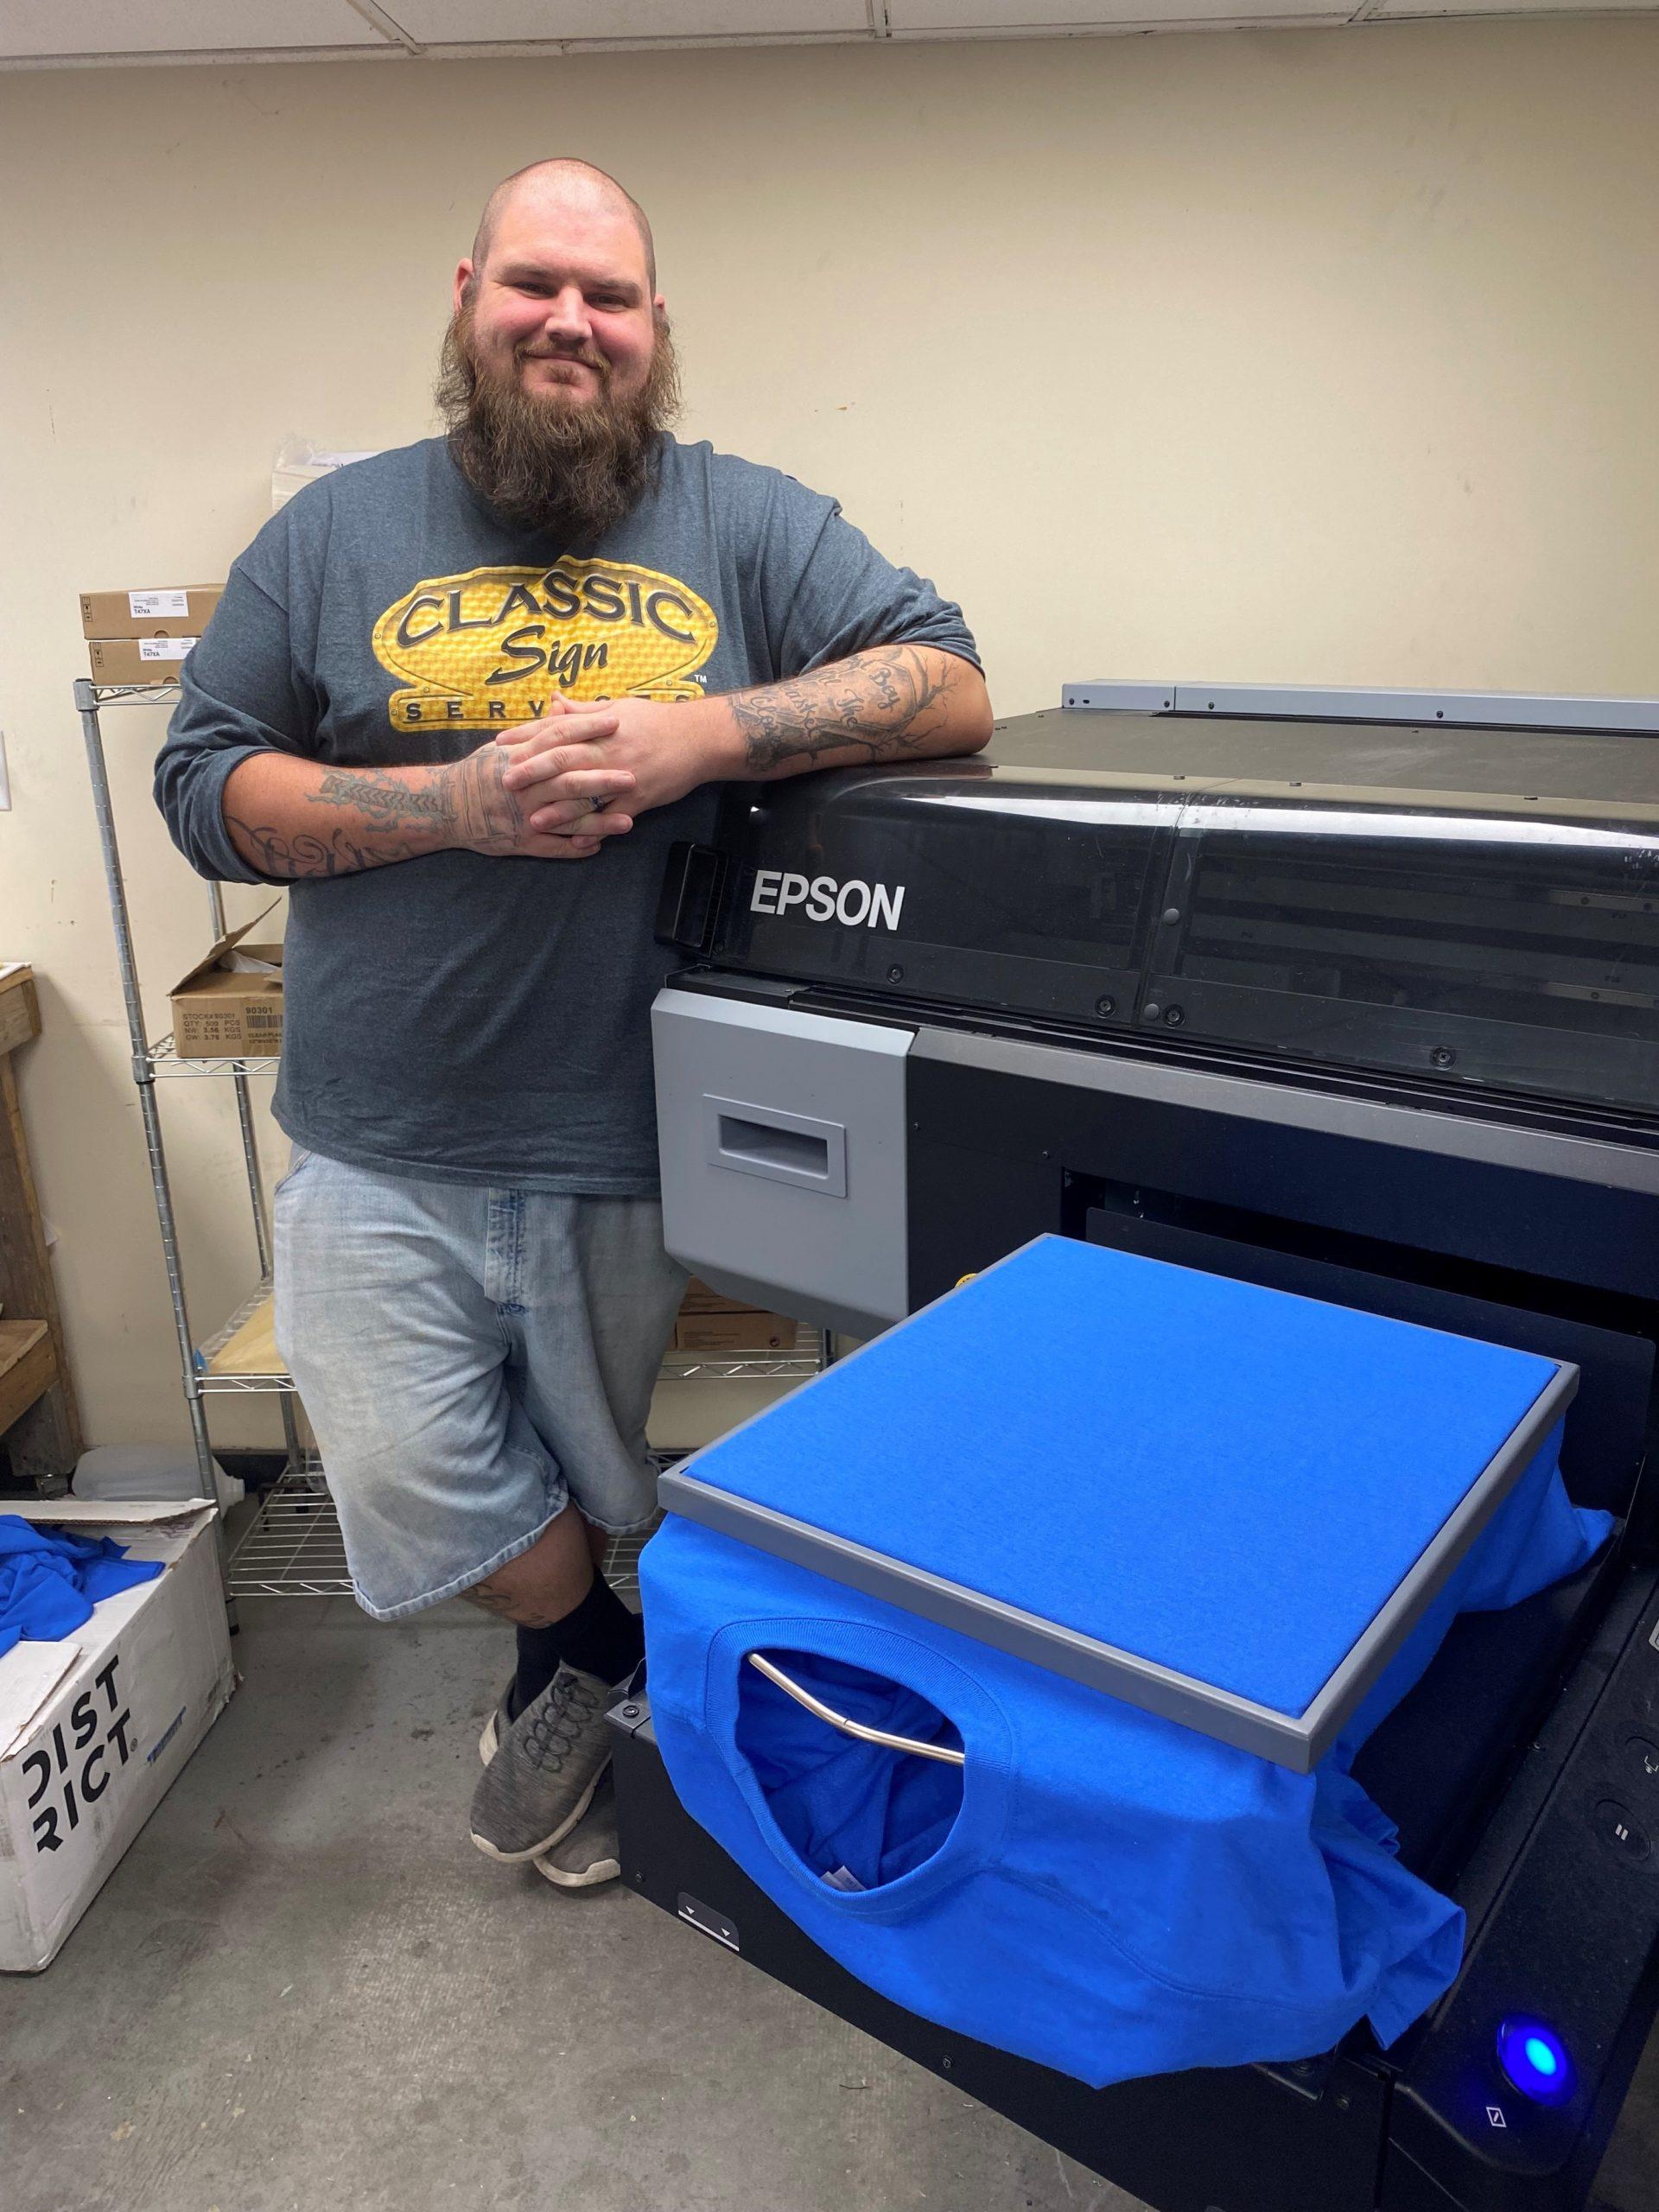 Brian Tidd standing beside the direct-to-garment (DTG) t-shirt printer